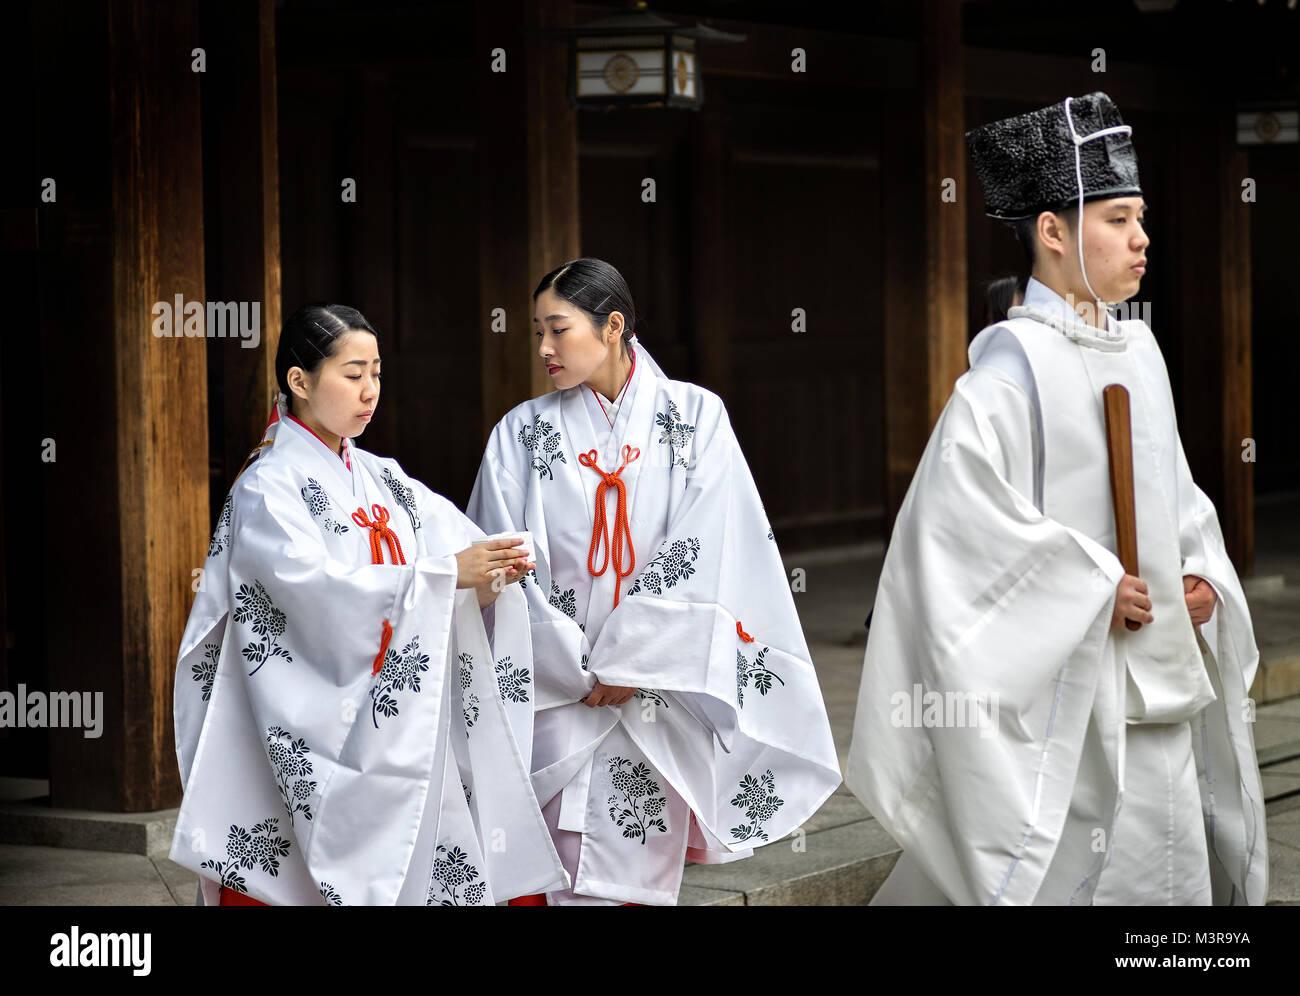 Japan, Honshu island, Kanto, Tokyo, wedding ceremony. - Stock Image